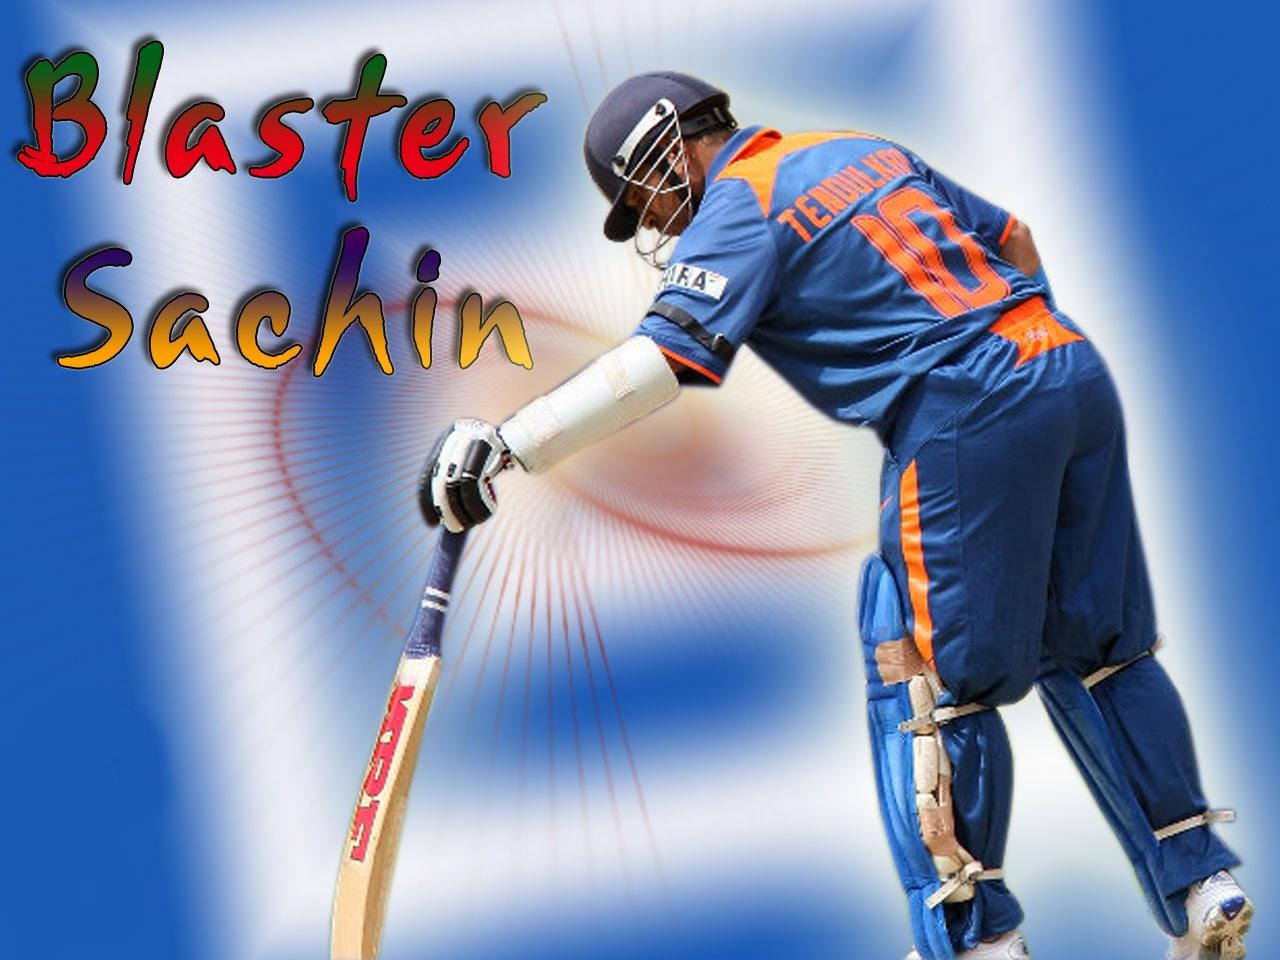 HD Wallpapers Of Sachin (109 Wallpapers) – HD Wallpapers Sachin Tendulkar Wallpapers Hd